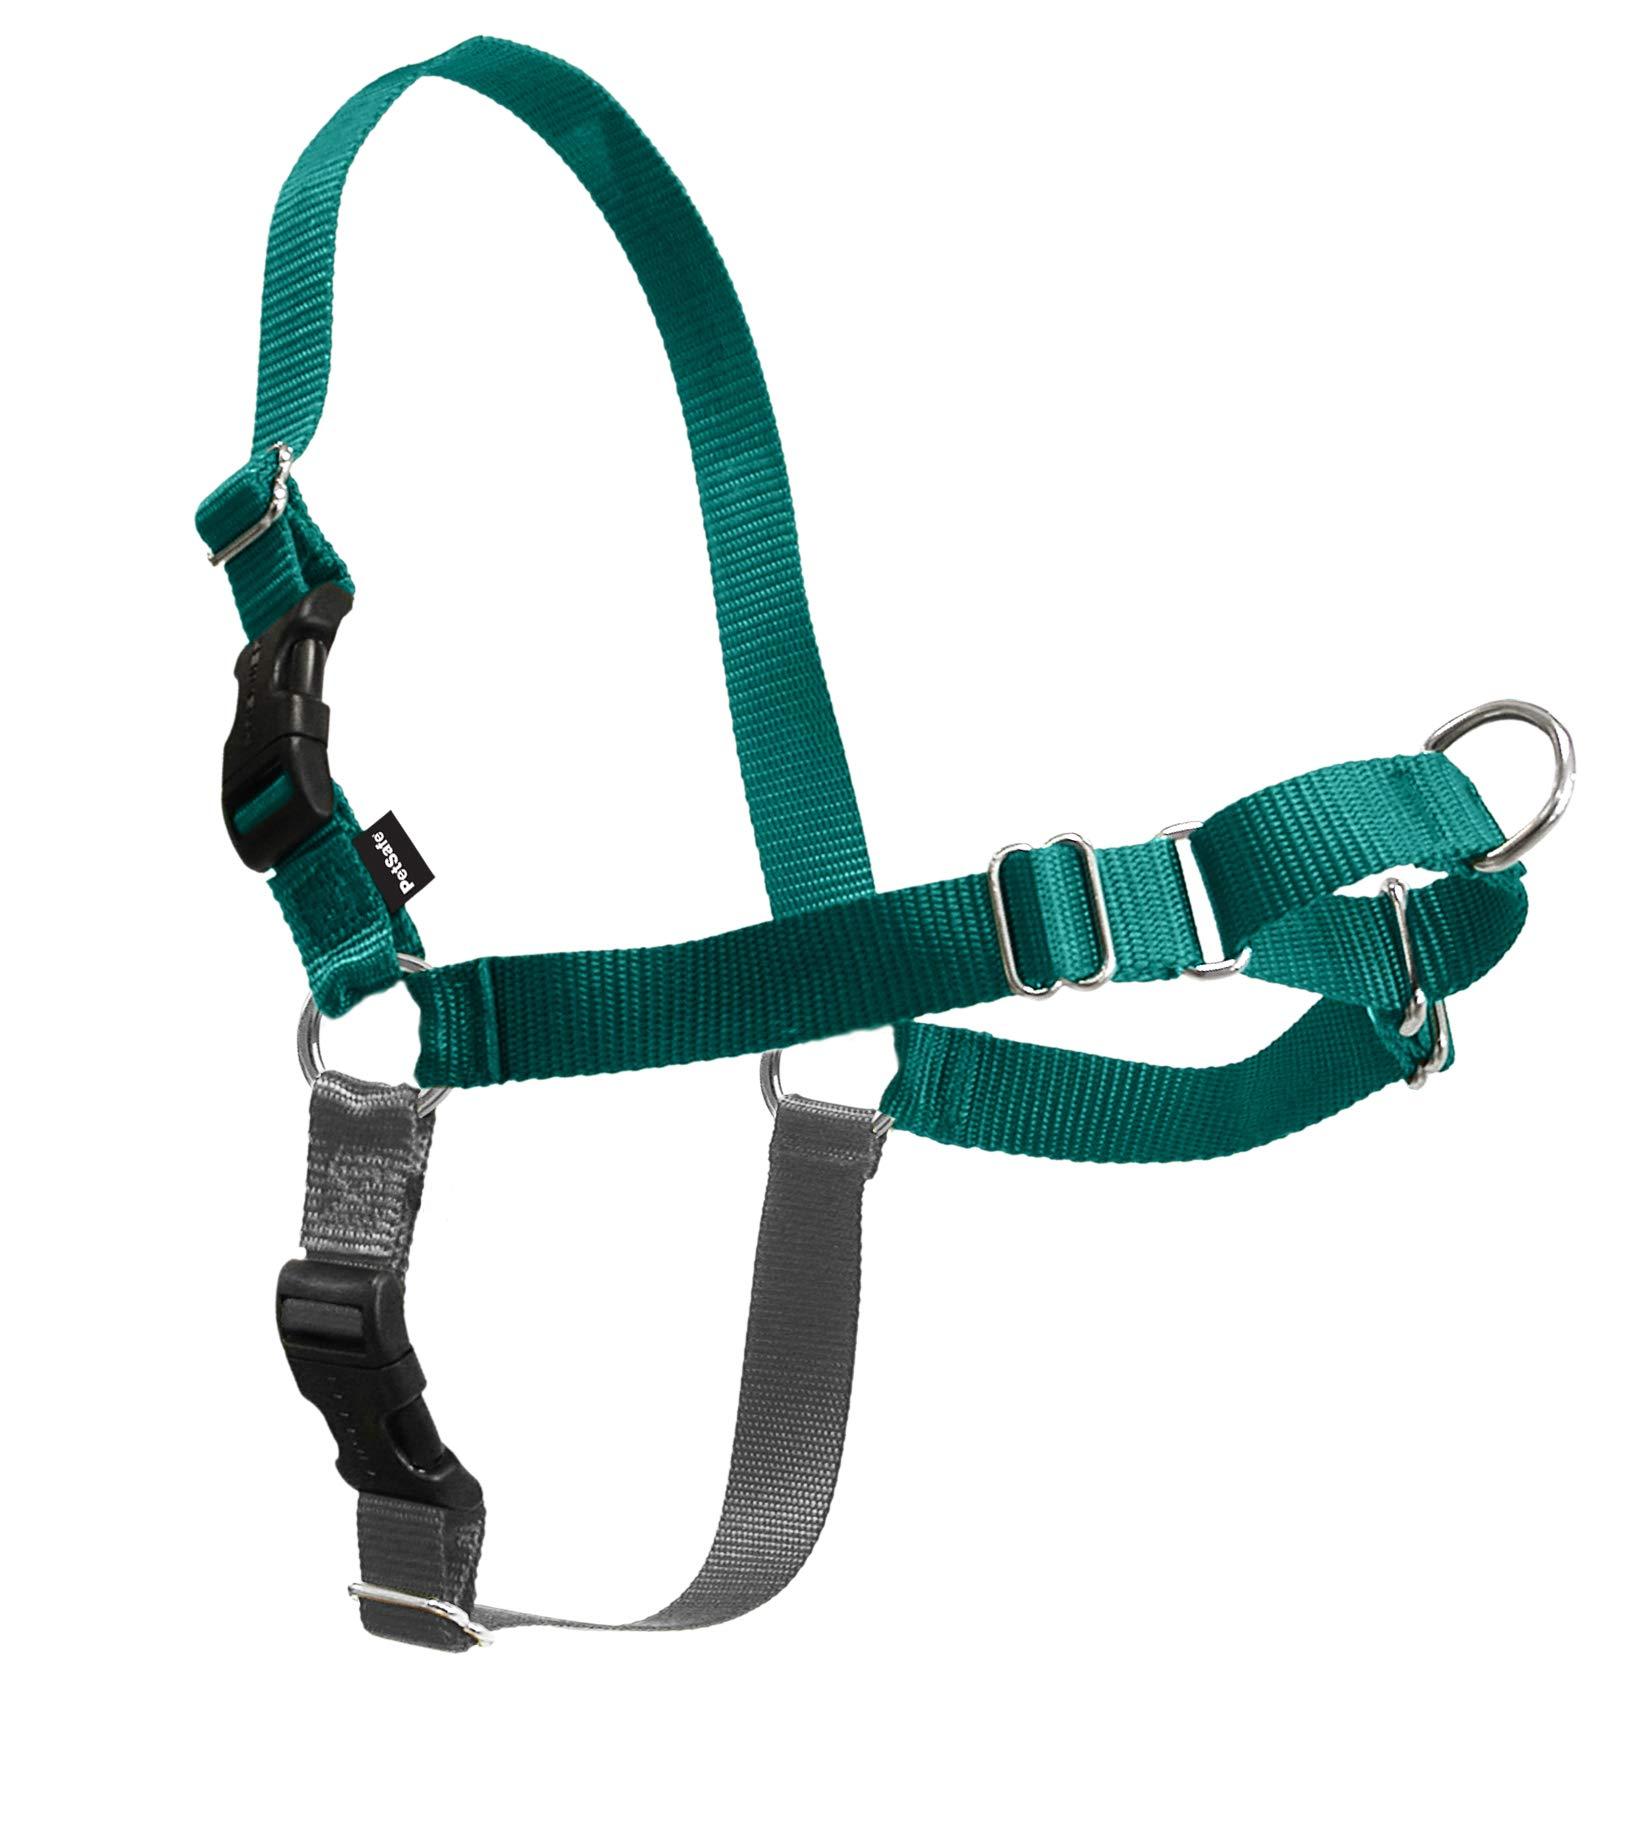 PetSafe Easy Walk Dog Harness, Teal, Medium by PetSafe